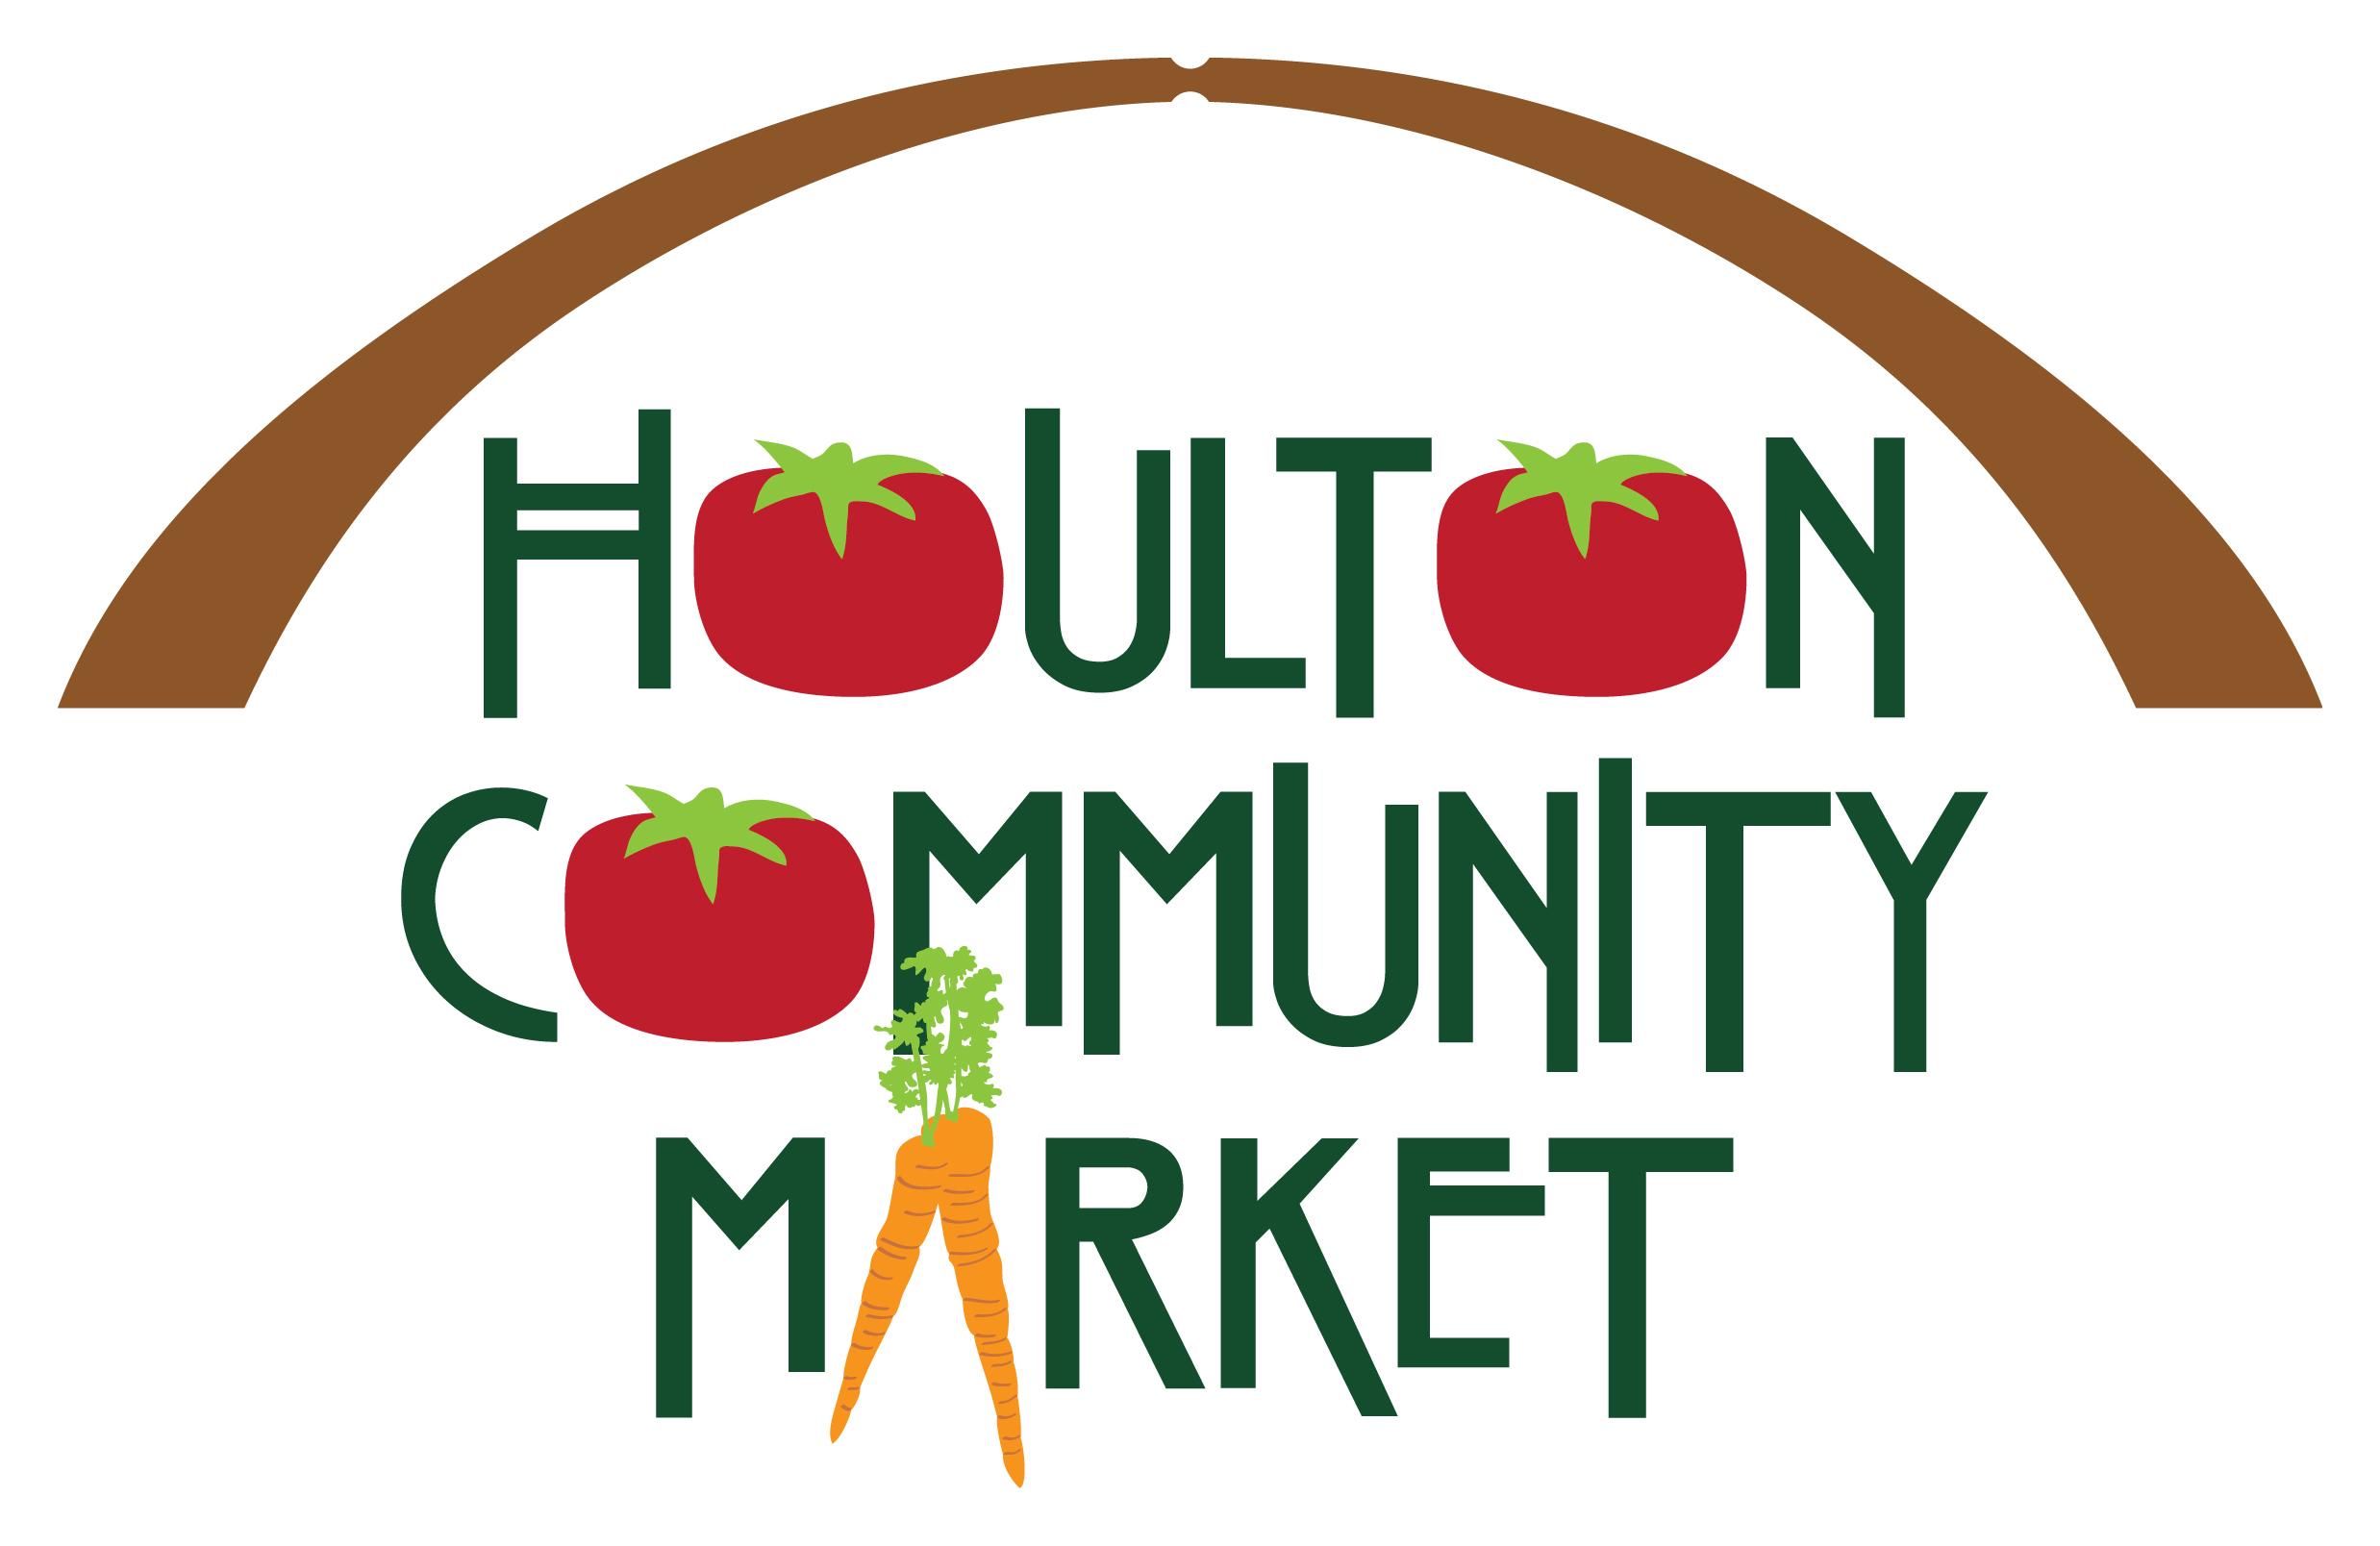 Houlton_Community_Market.jpg.